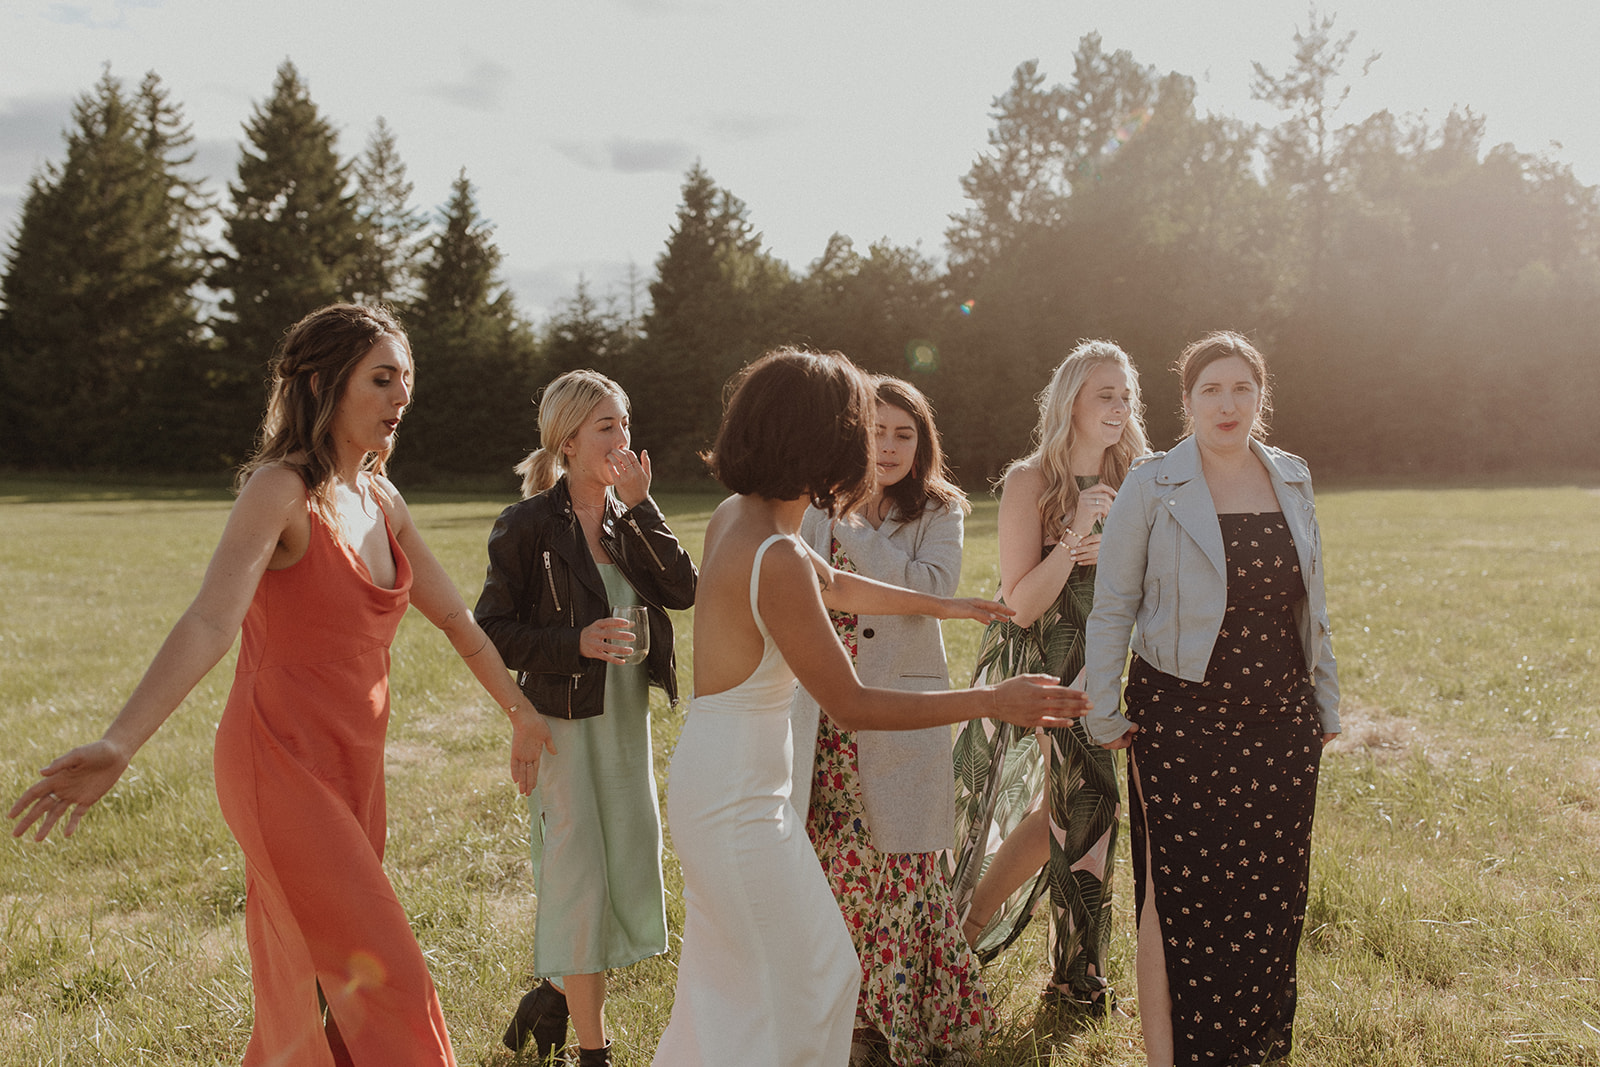 cortney_skye_wedding_june2019-595.jpg